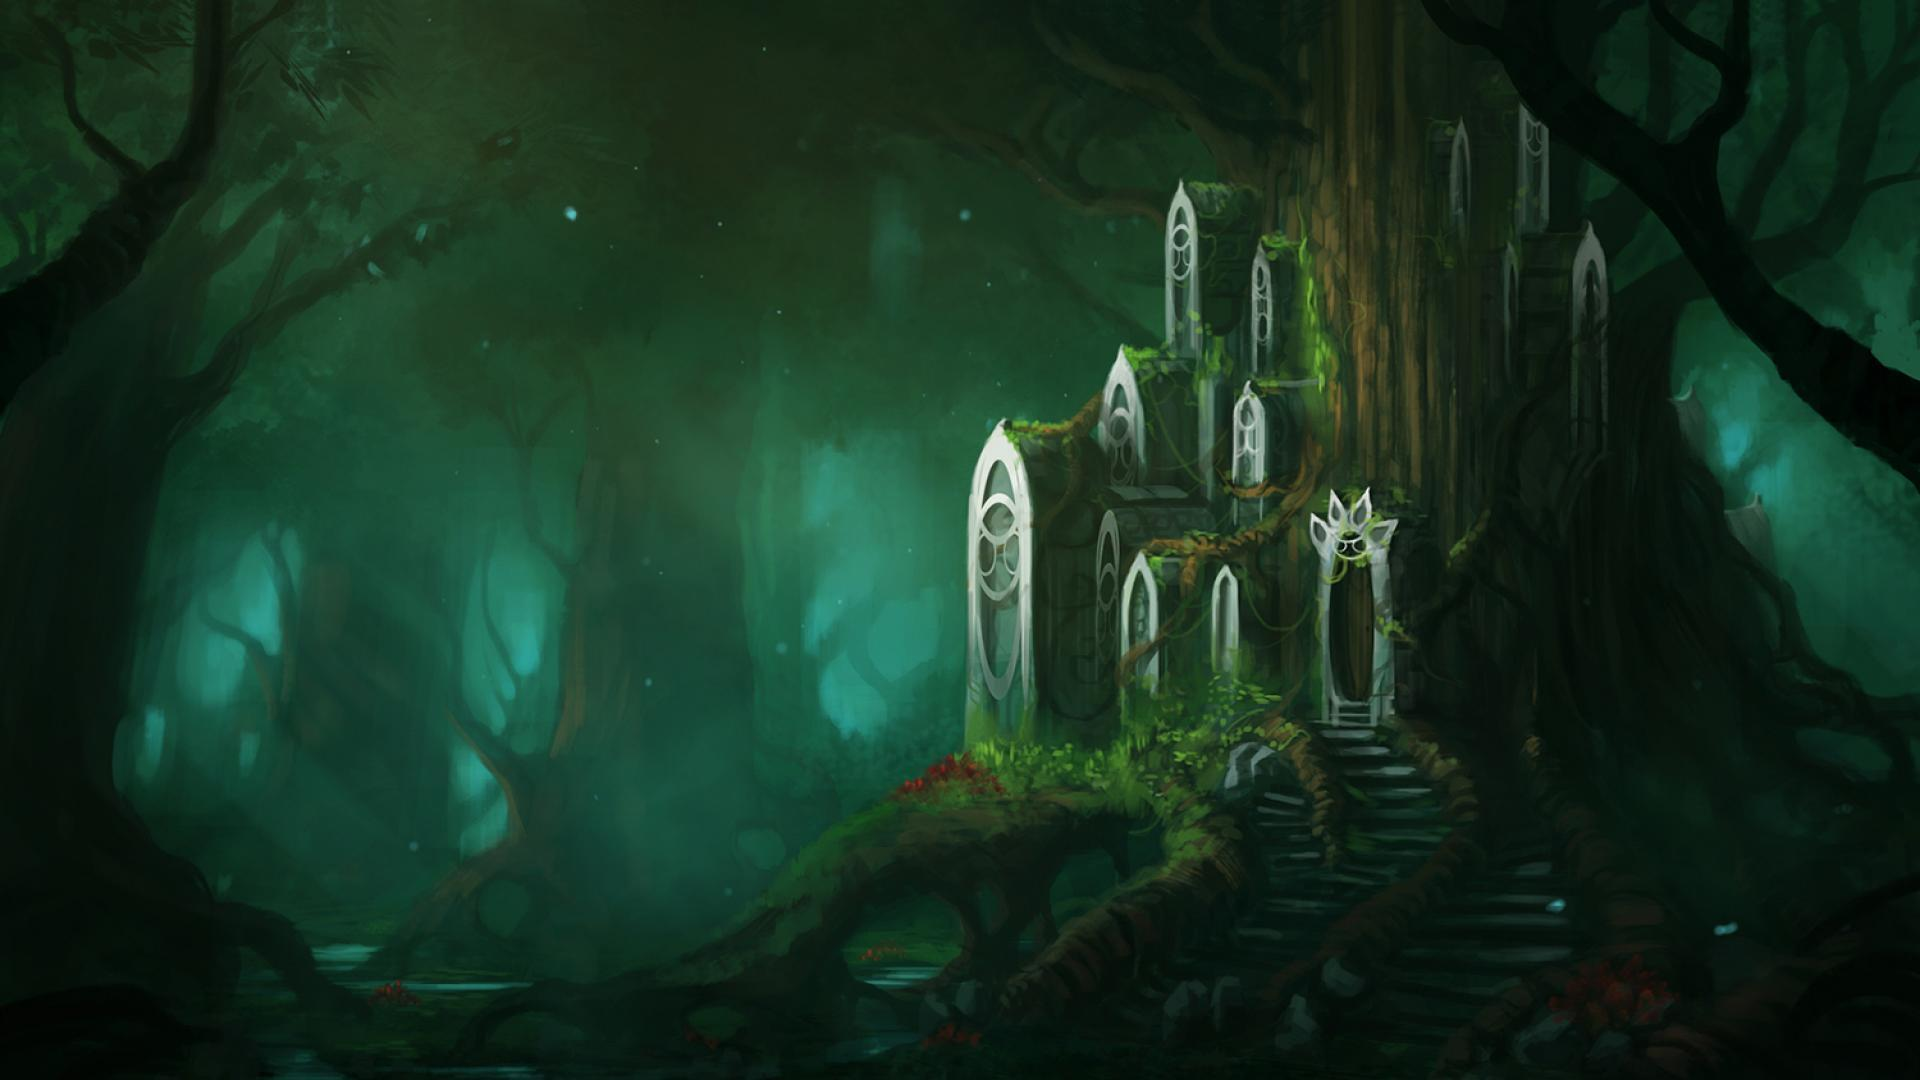 1920x1080 Fantasy Forest hình nền HD